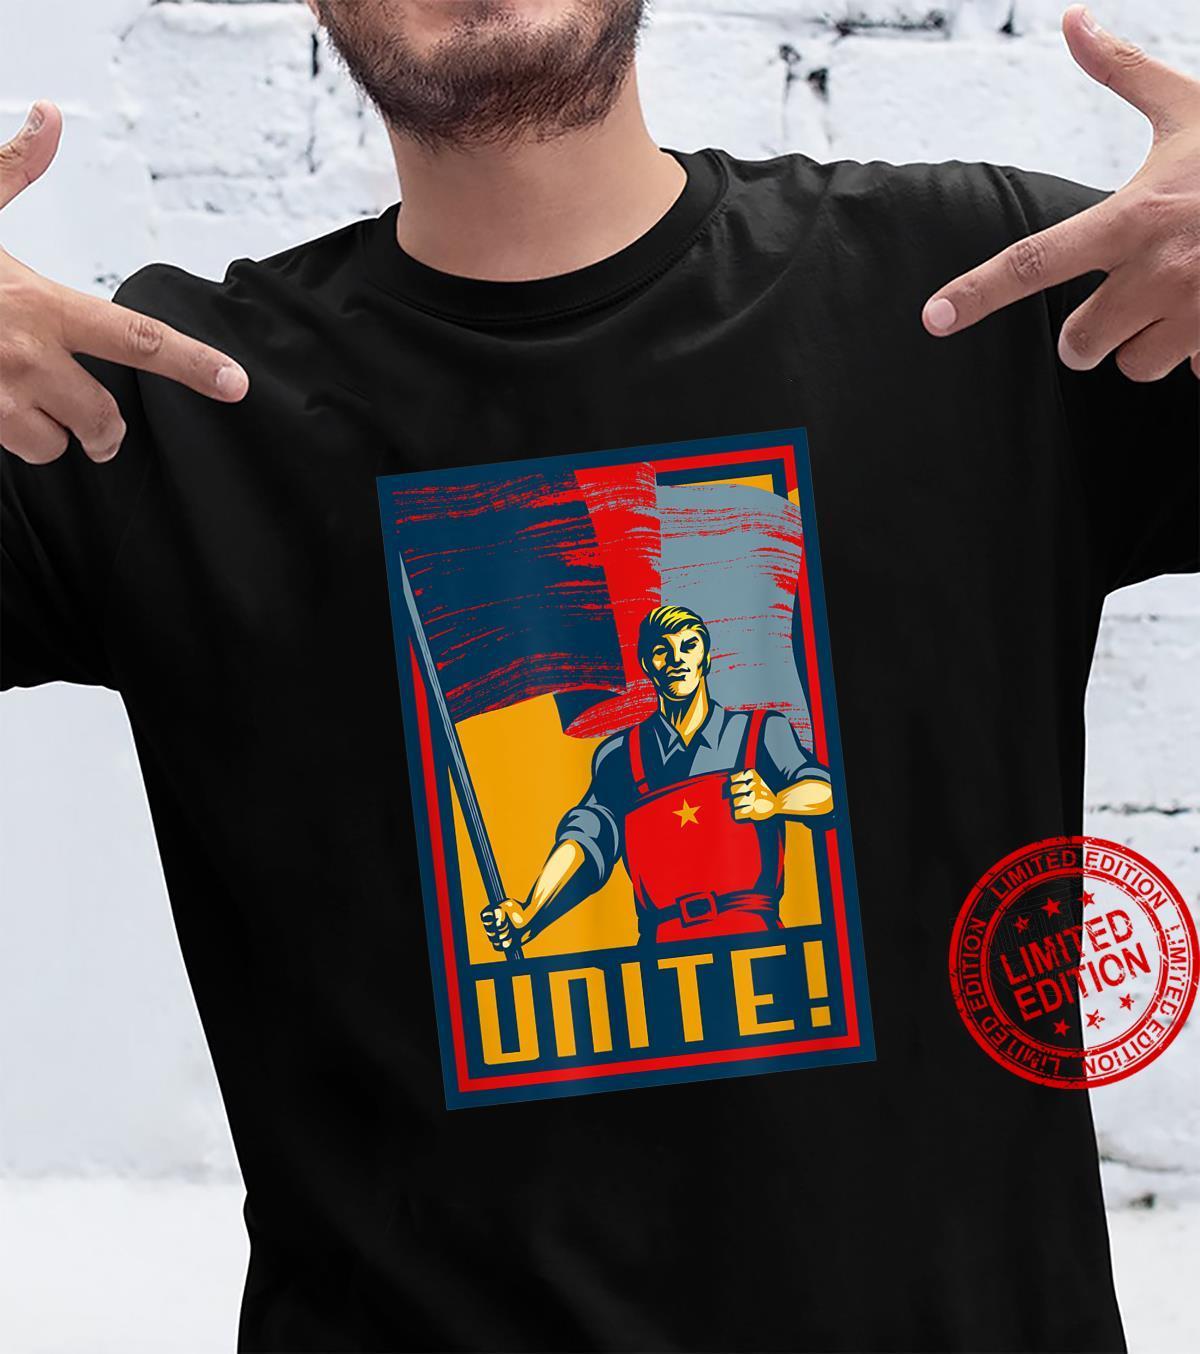 Workers Unite SOVI8 Vintage Propaganda. Shirt